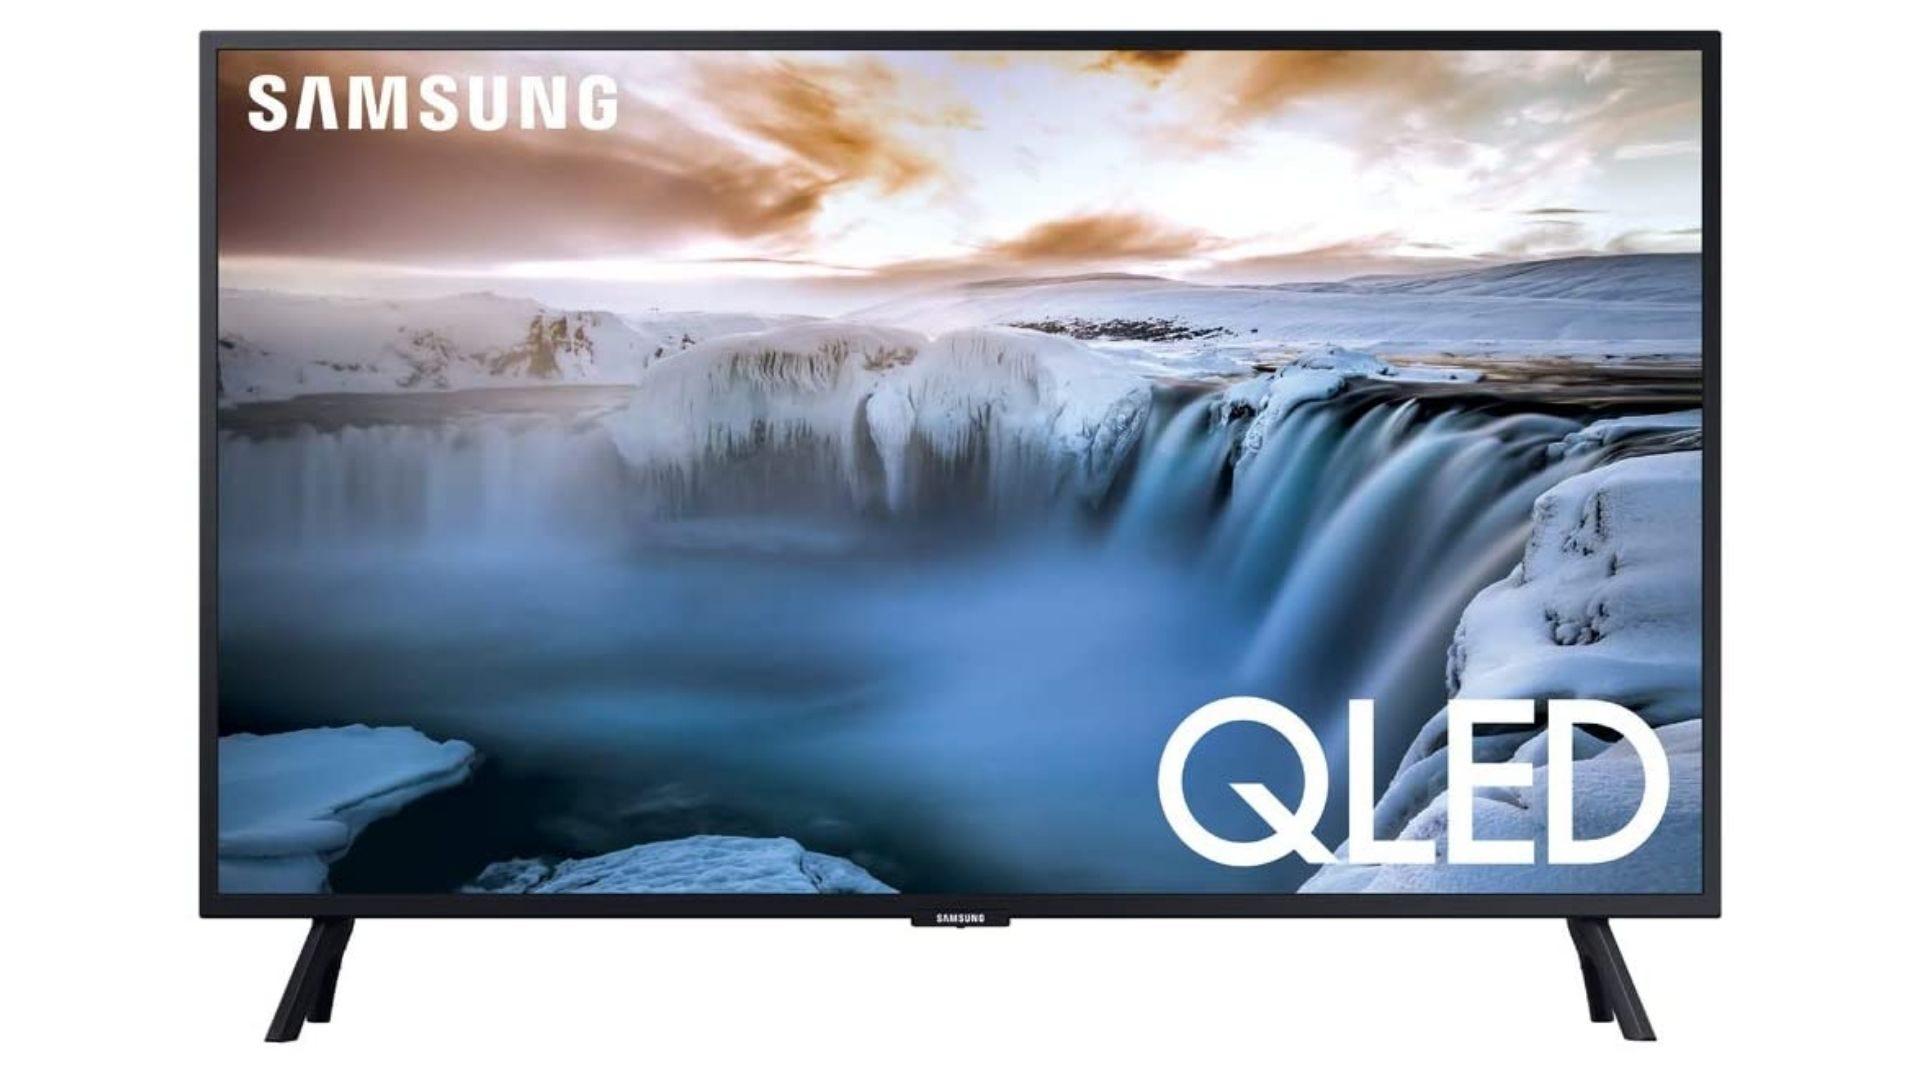 SAMSUNG QN32Q50RAFXZA Flat 32 QLED 4K 32Q50 Series Smart TV (2019 model)